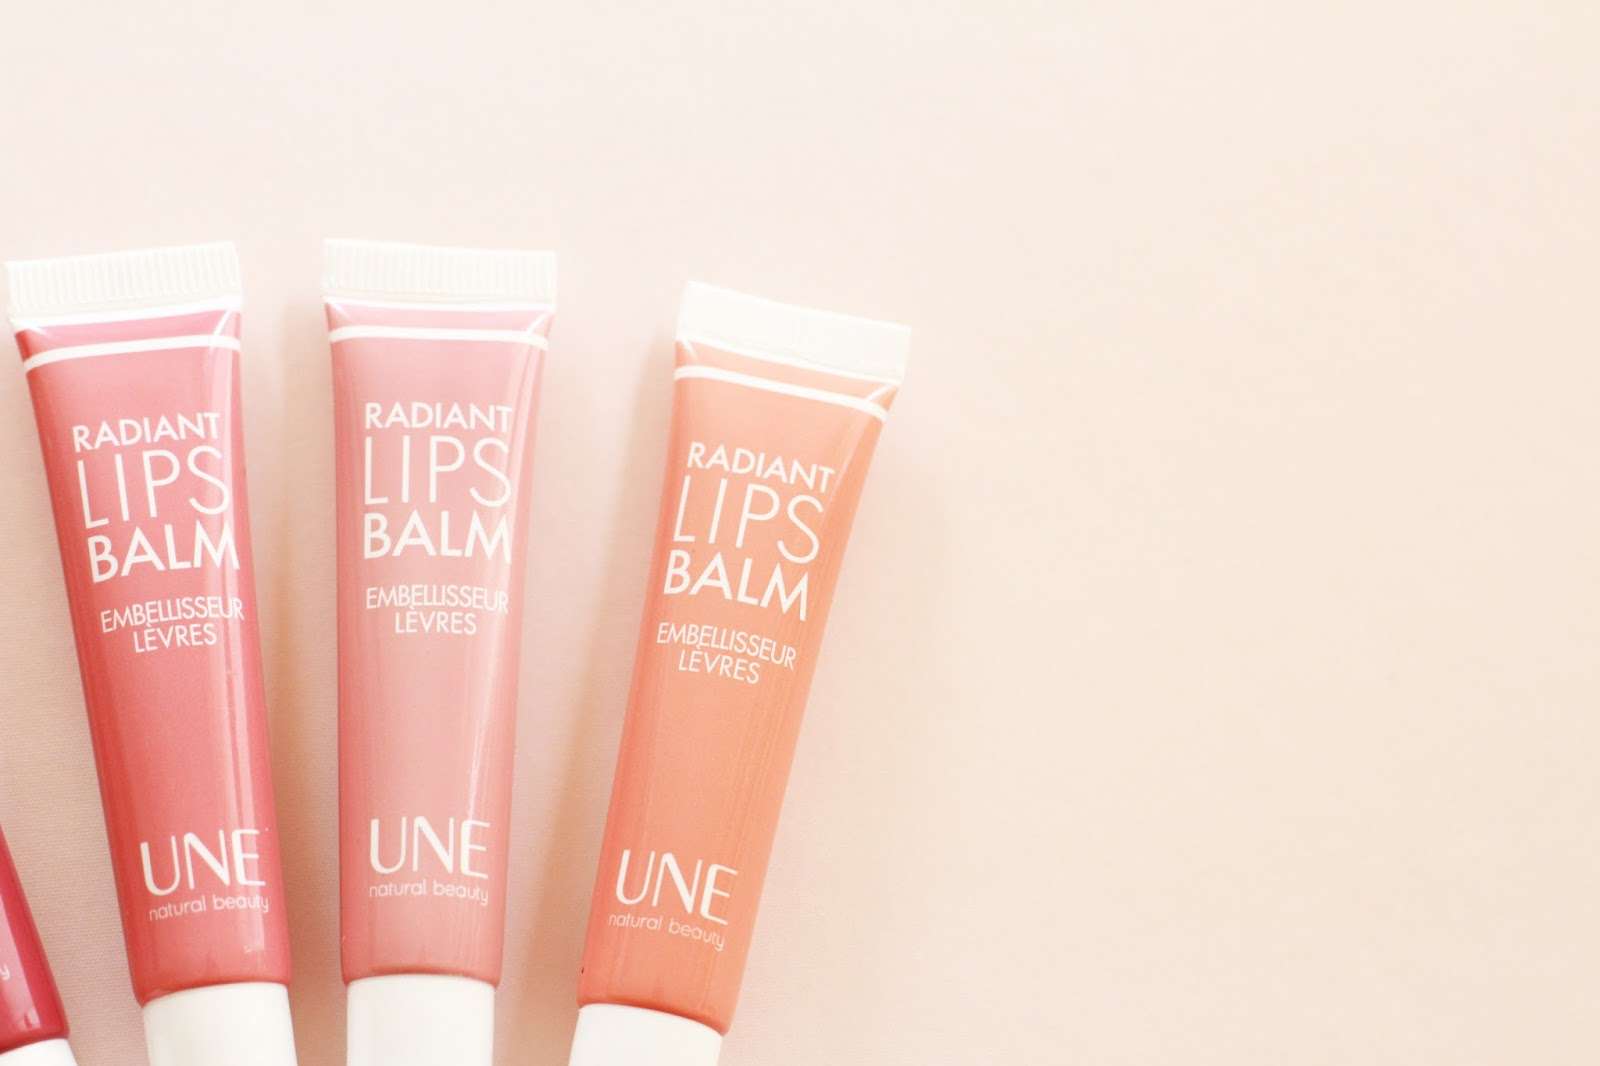 radiant lips balm